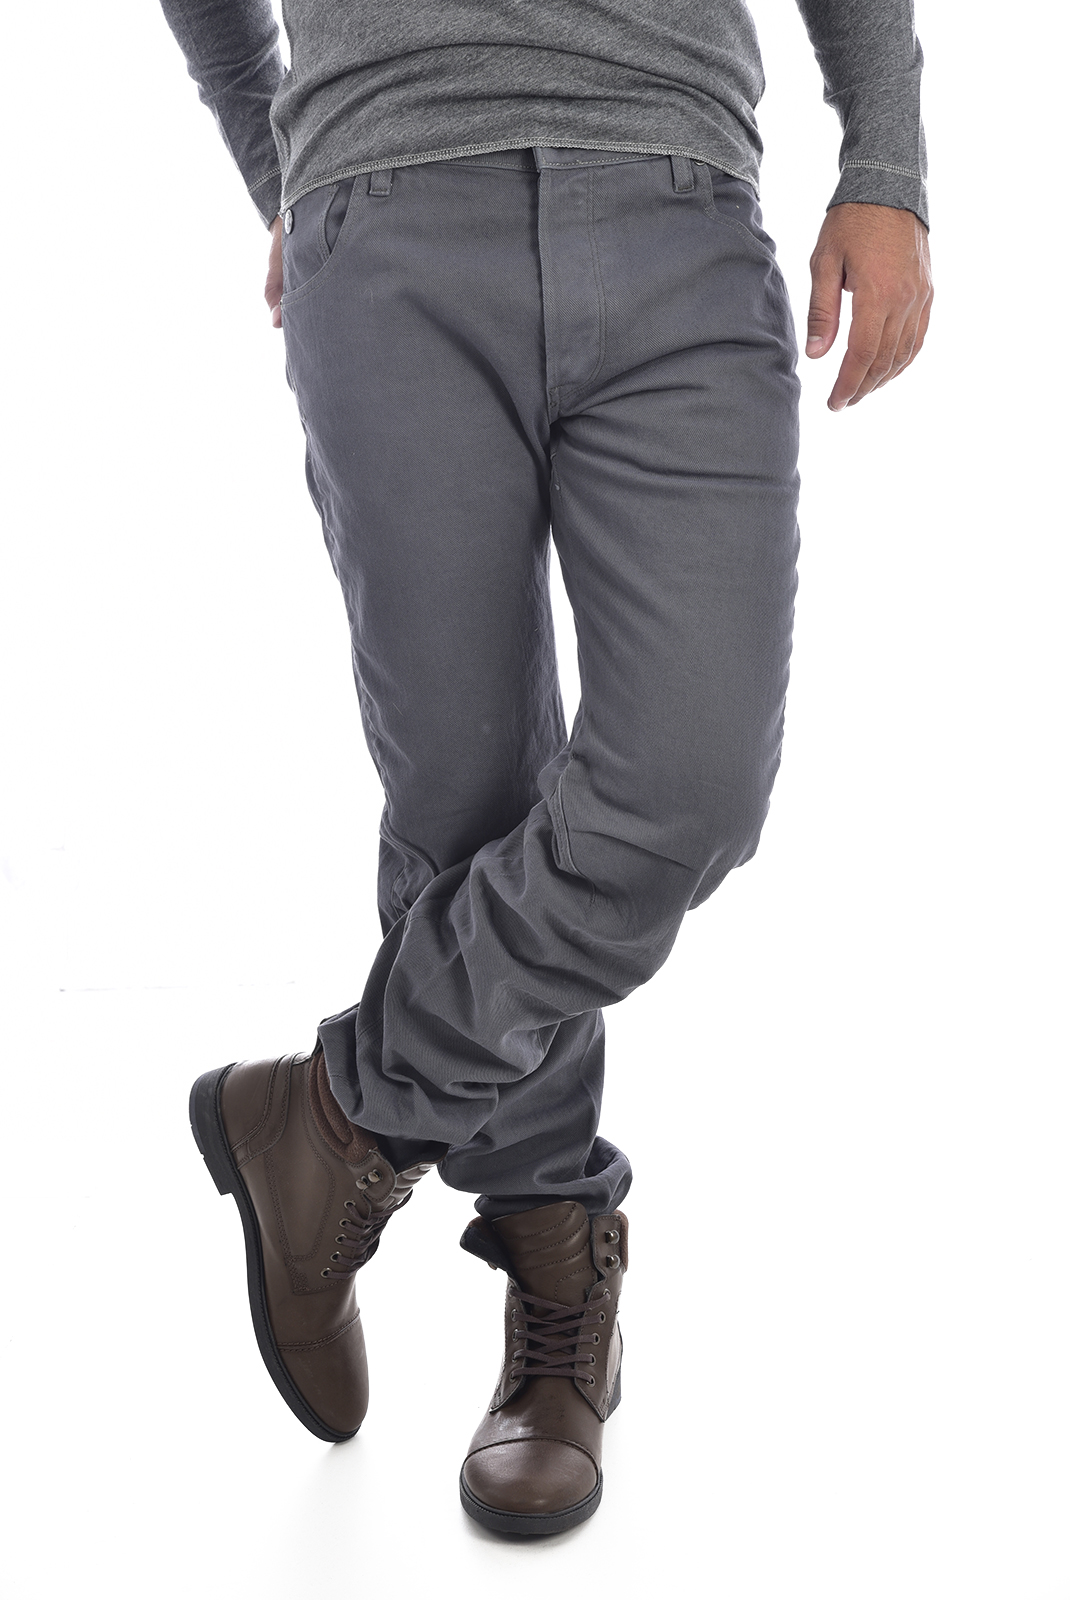 Jeans  G-star 51030F-6741-389 arc gris